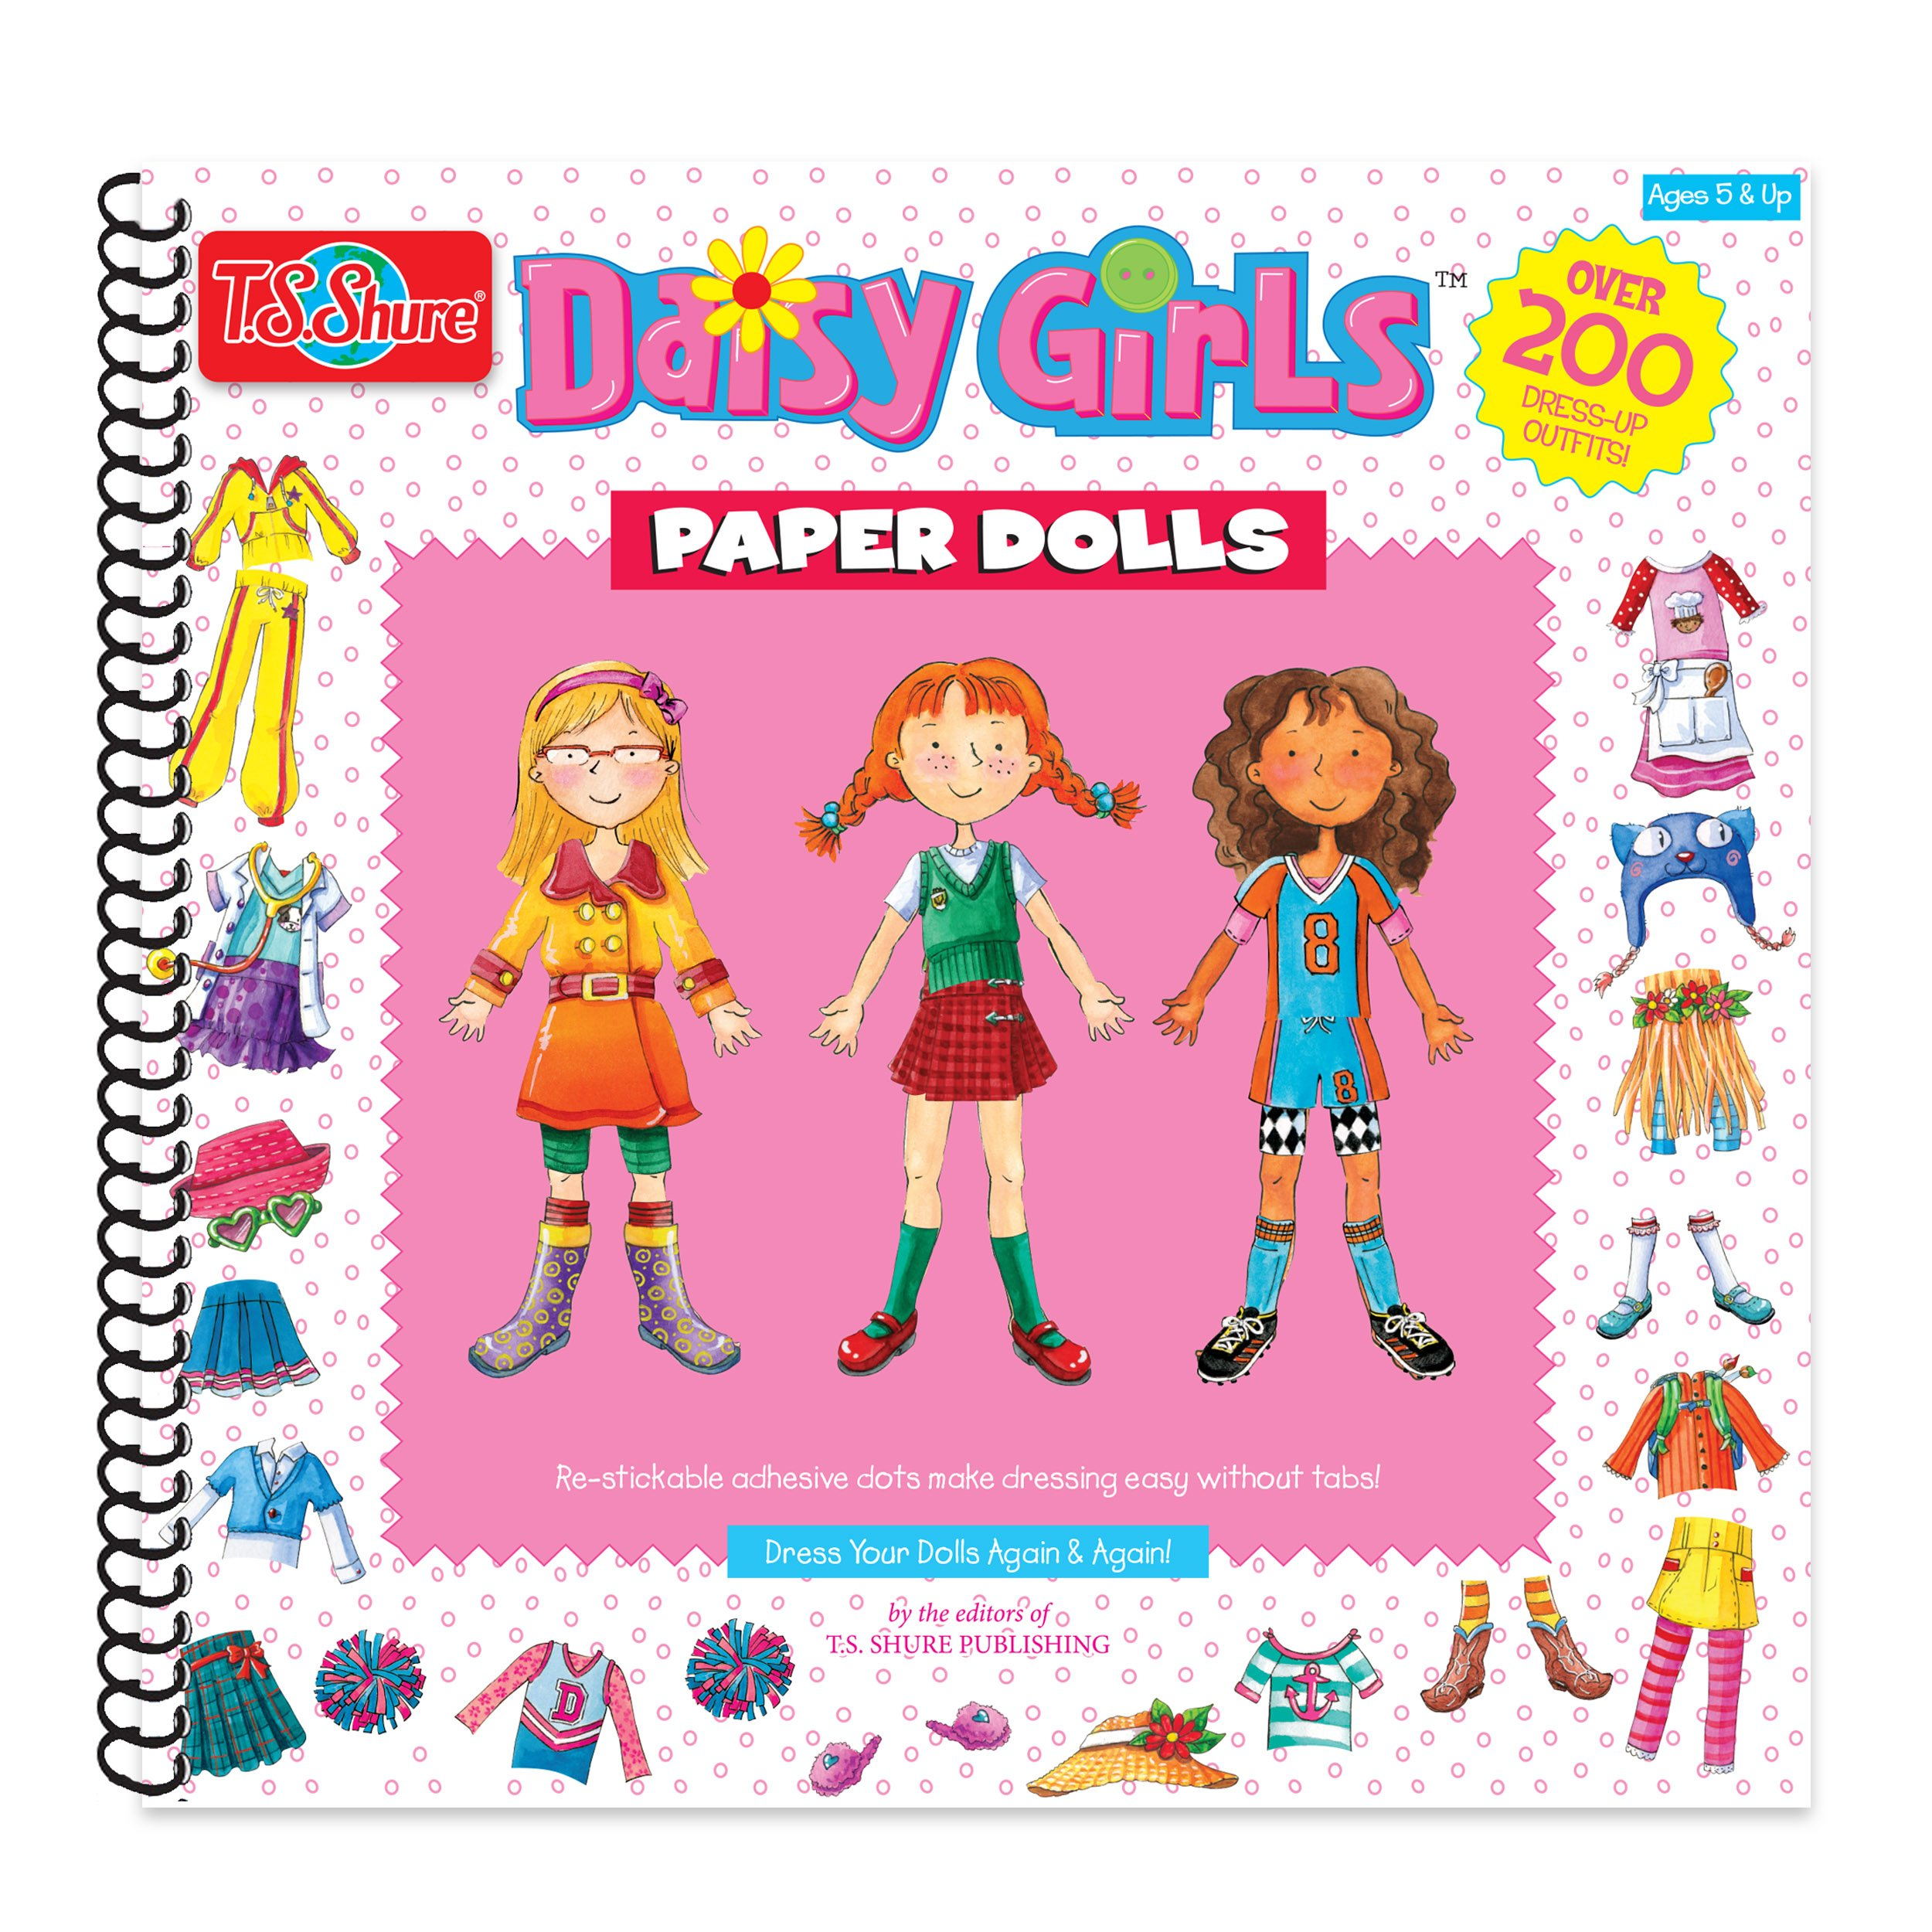 T.S. Shure Daisy Girls Paper Dolls Activity Book